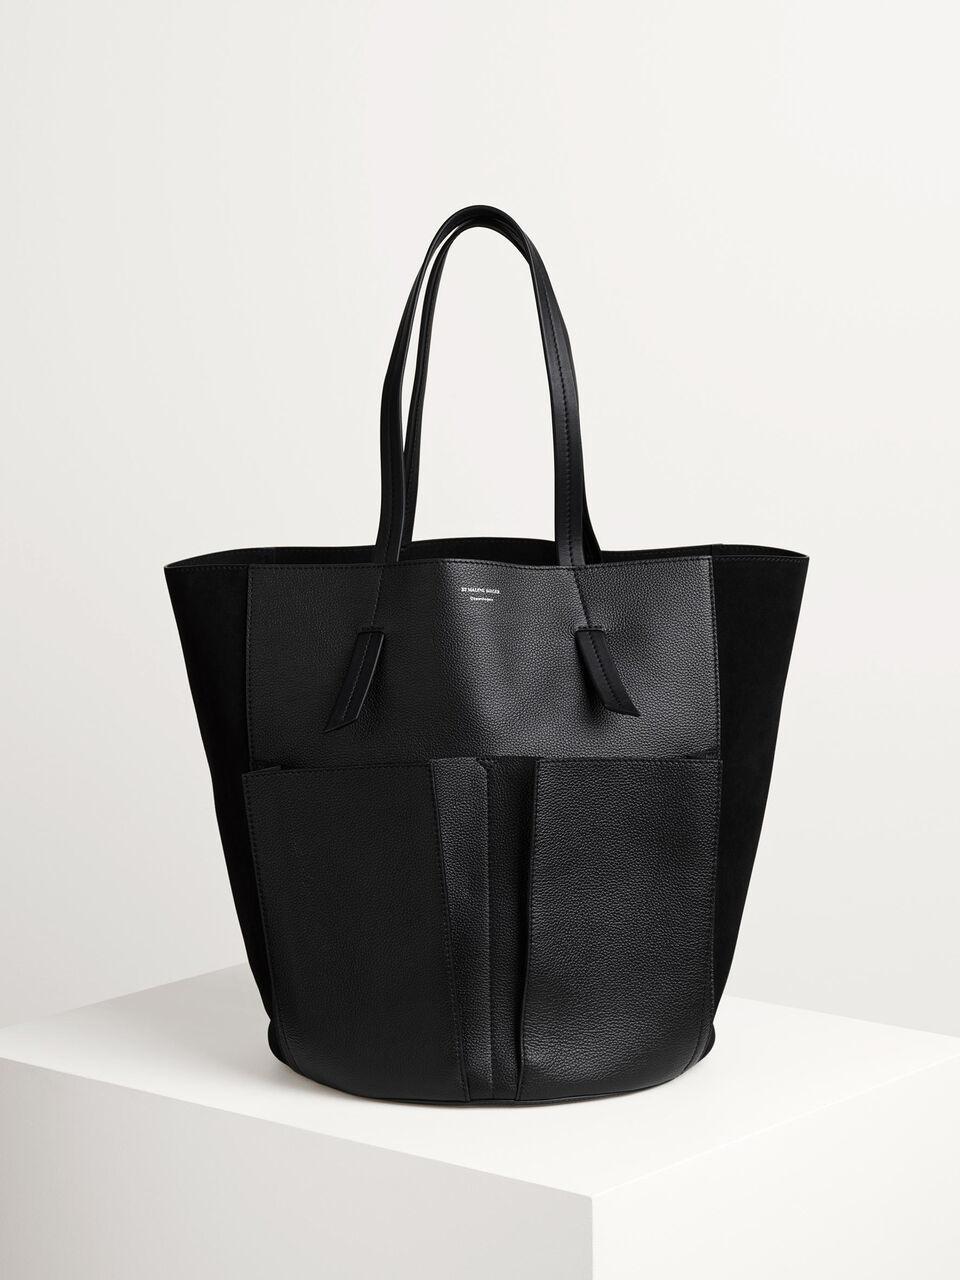 Tess tote bag by malene birger-1